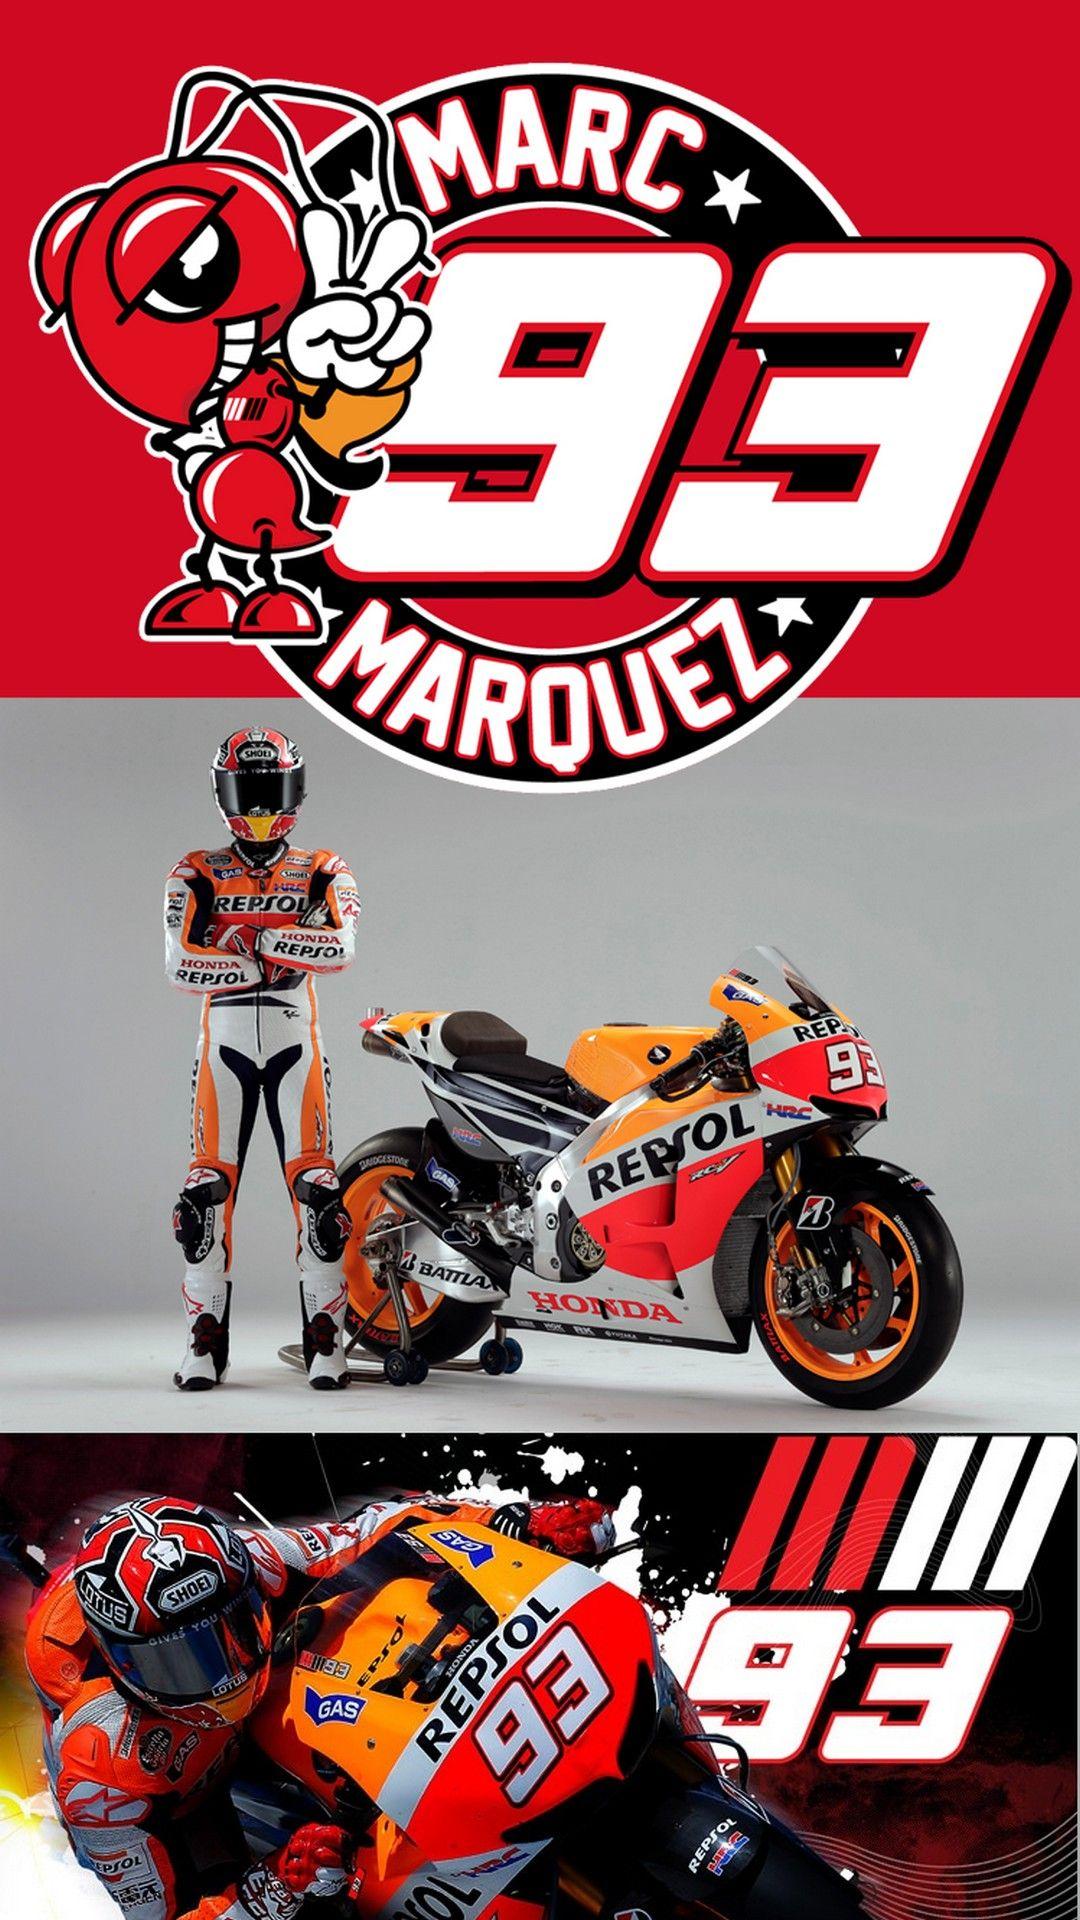 Wallpaper Ducati Corse Motogp Racing Bike 2019 Di 2020 Ducati Ducati Hypermotard Ducati 848